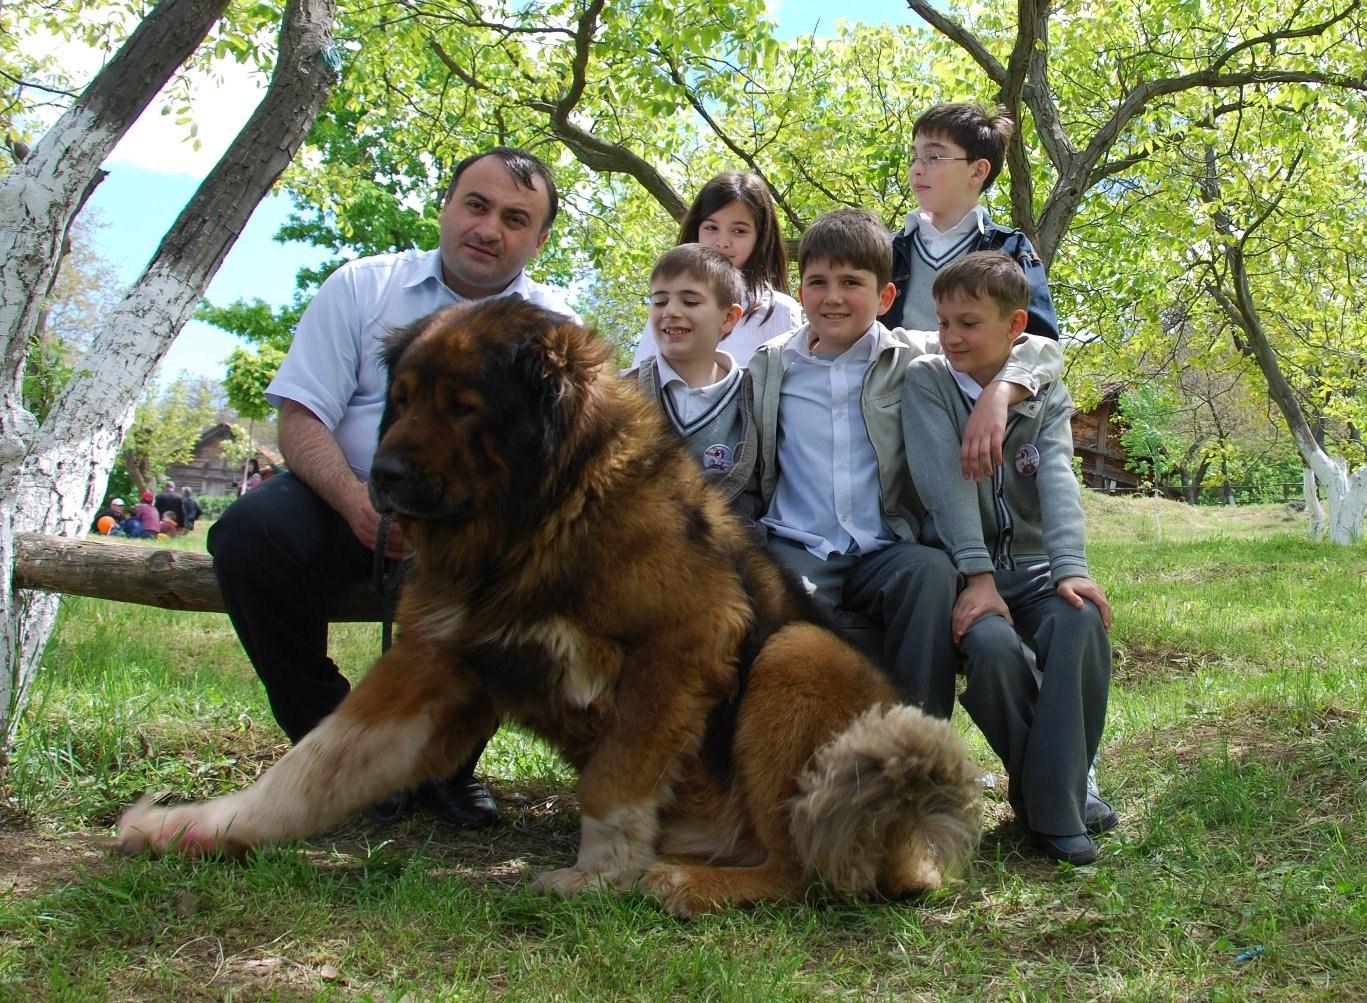 Кавказская овчарка: собака для ... Images - Frompo